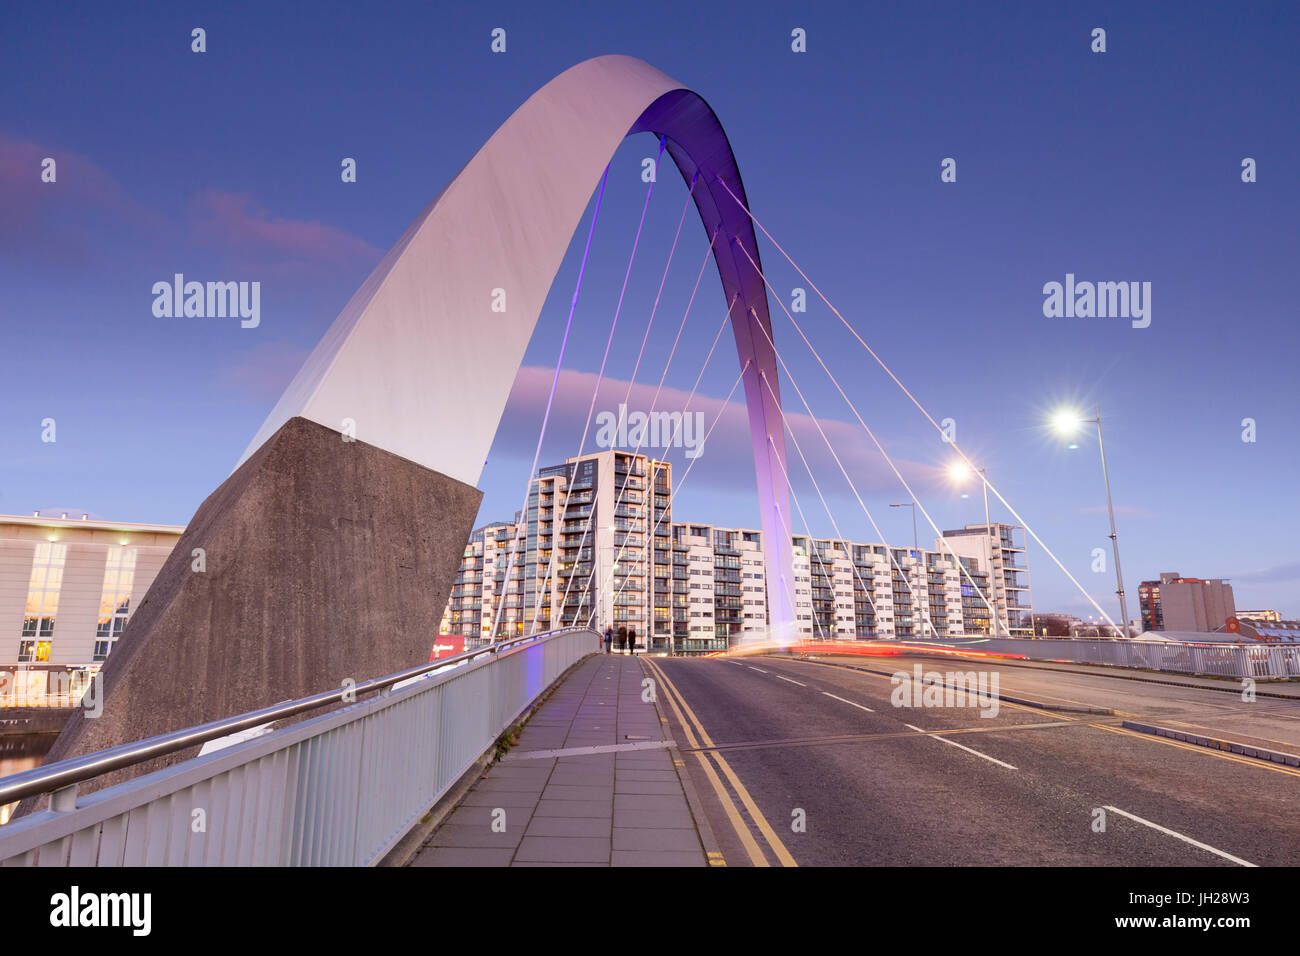 The Clyde Arc Bridge (Squinty Bridge), view towards Finnieston, Glasgow, Scotland, United Kingdom, Europe - Stock Image